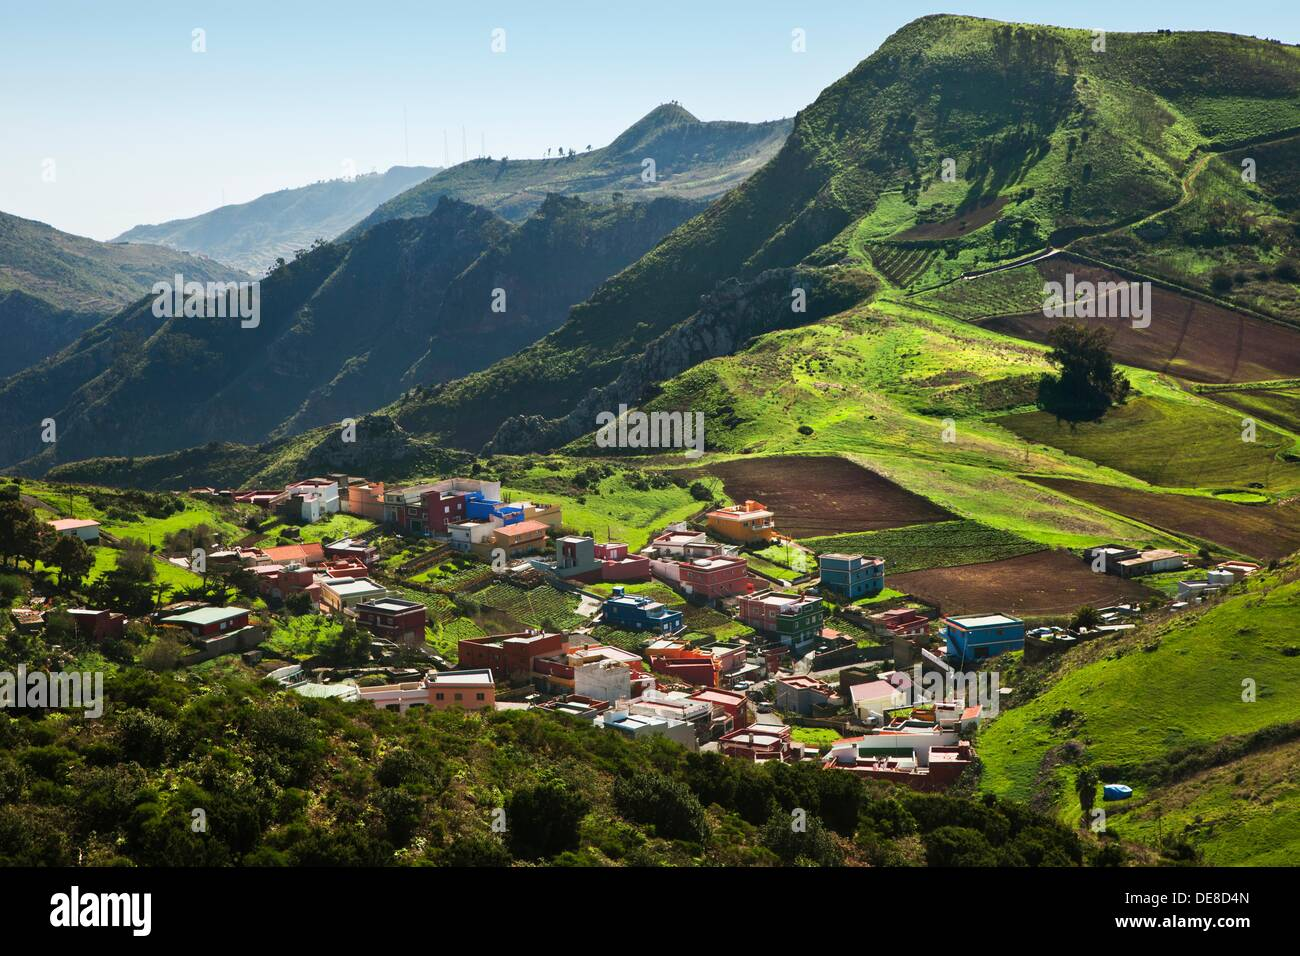 Las Mercedes Anaga Rural Park Tenerife Canary Islands Spain. - Stock Image